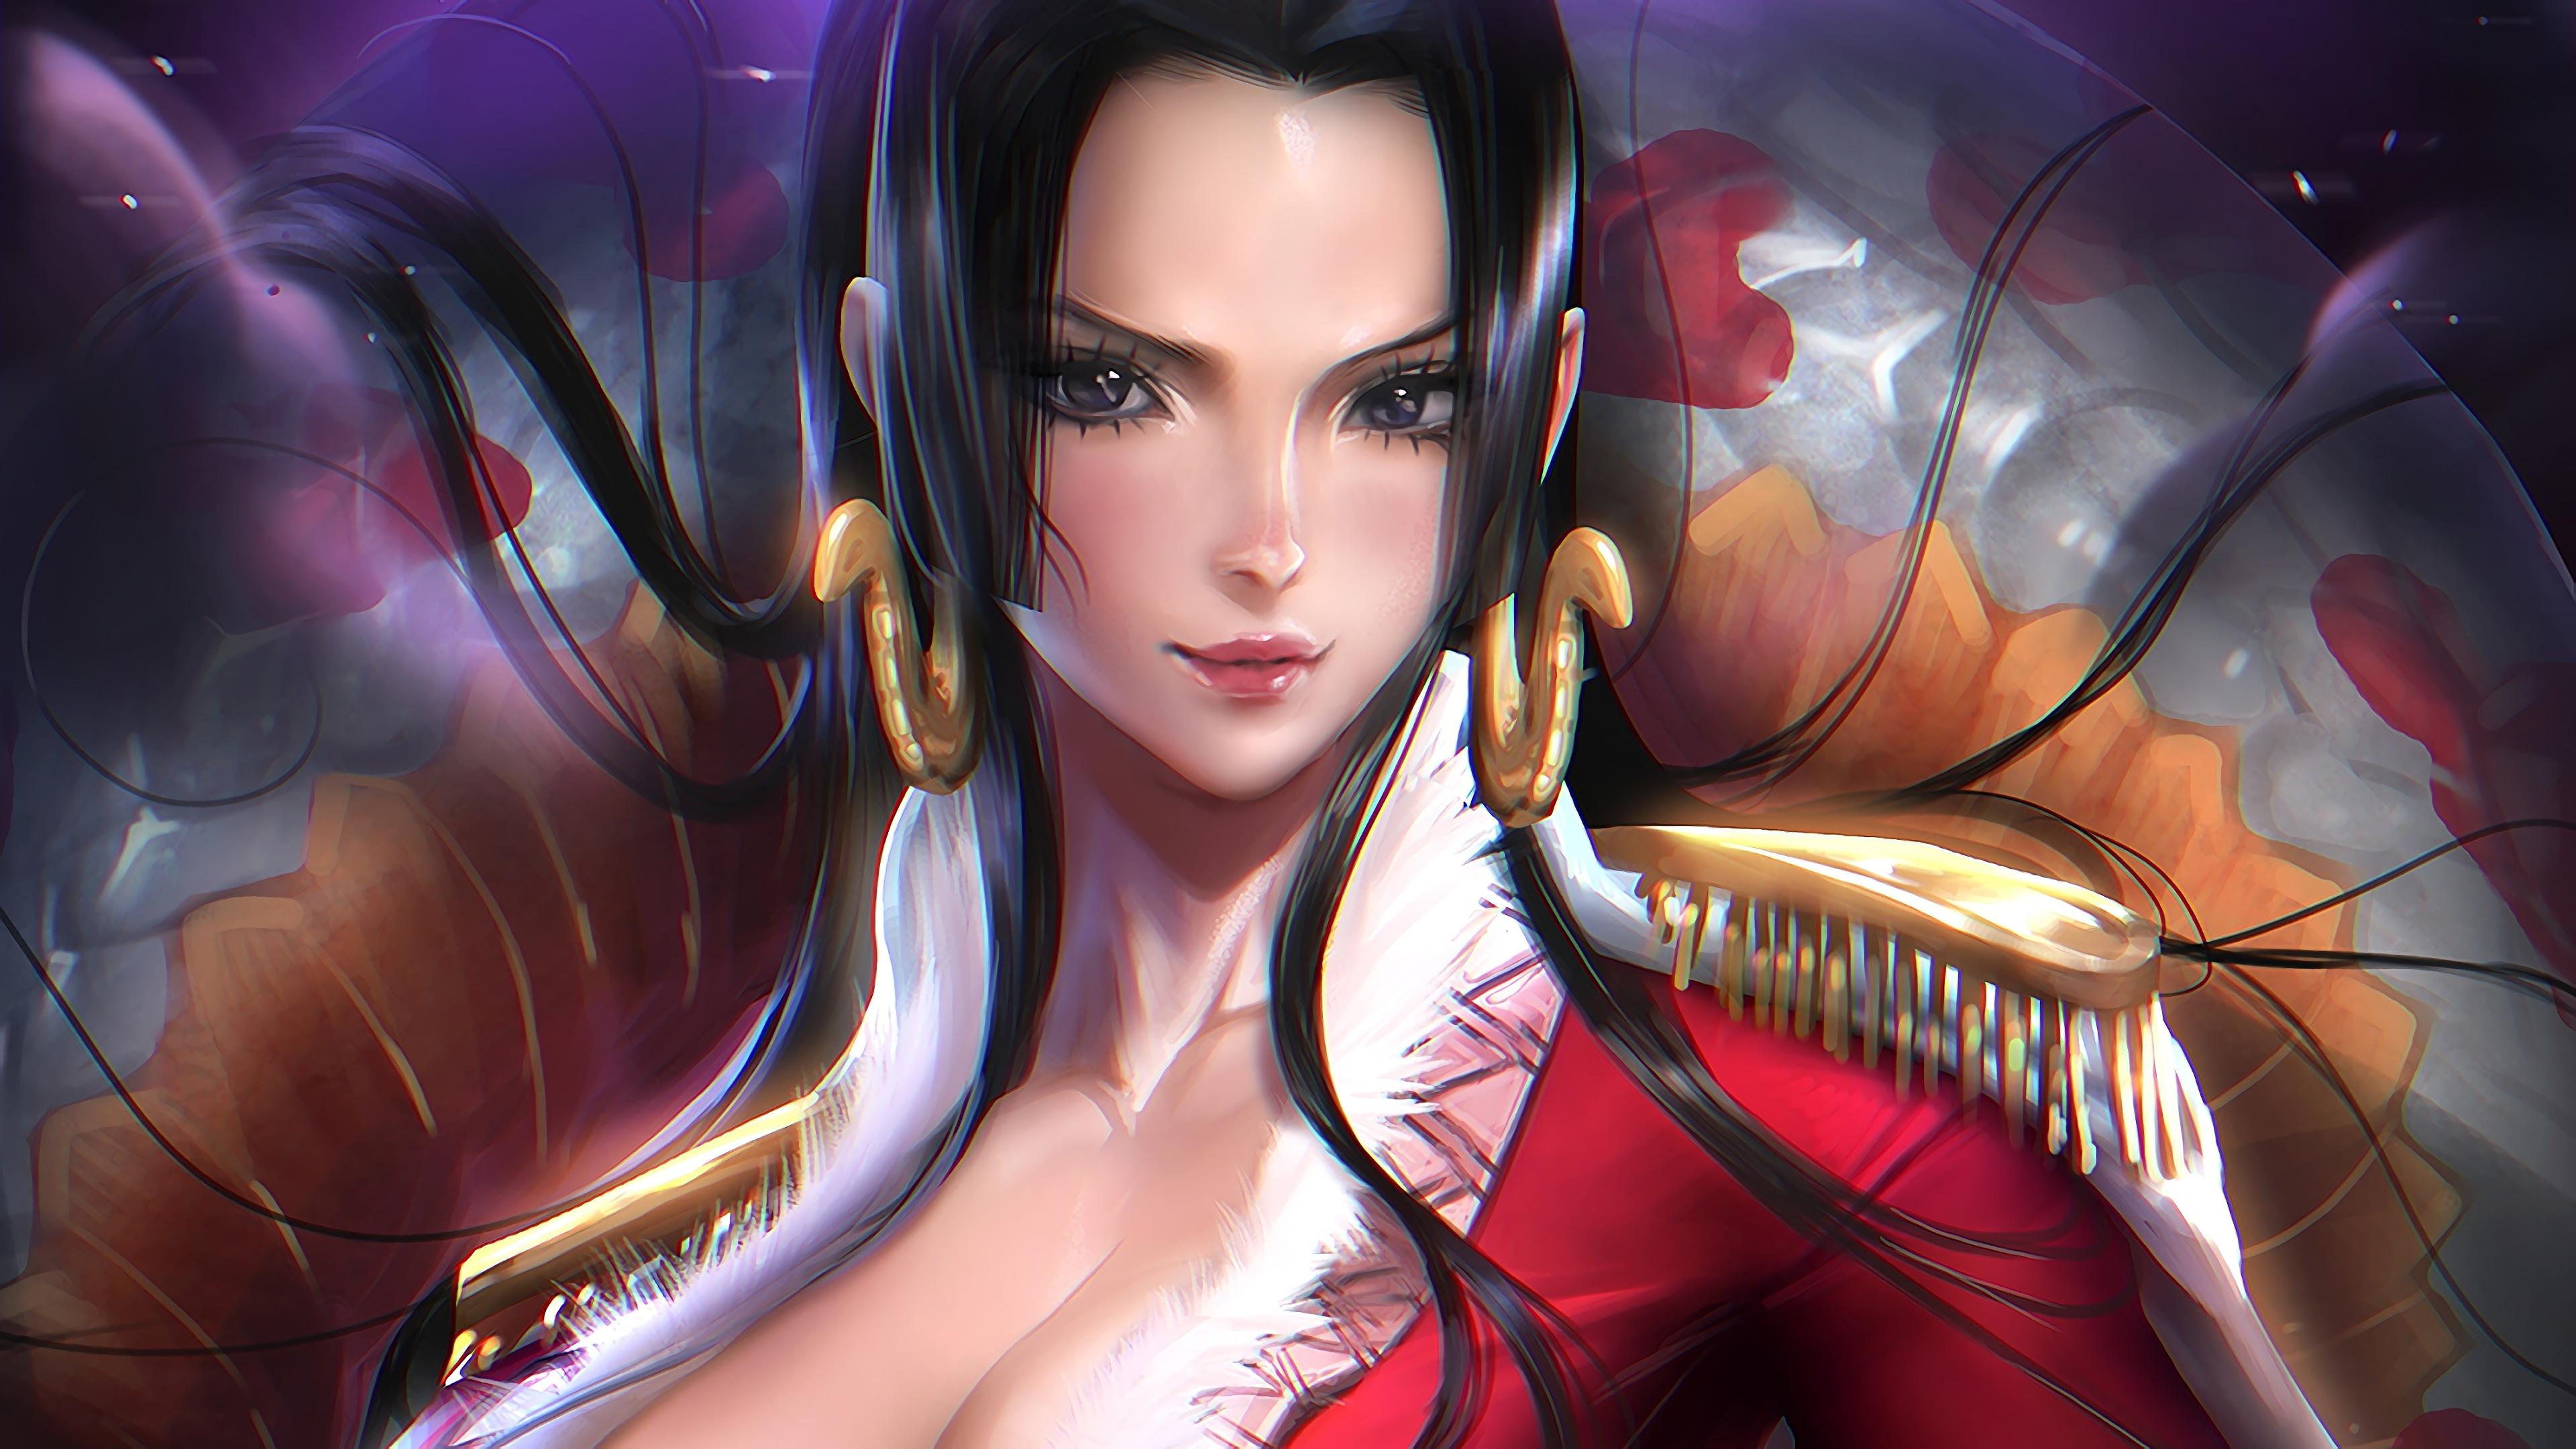 Hd Girl Wallpapers 4k Sanji One Piece 4k 8137